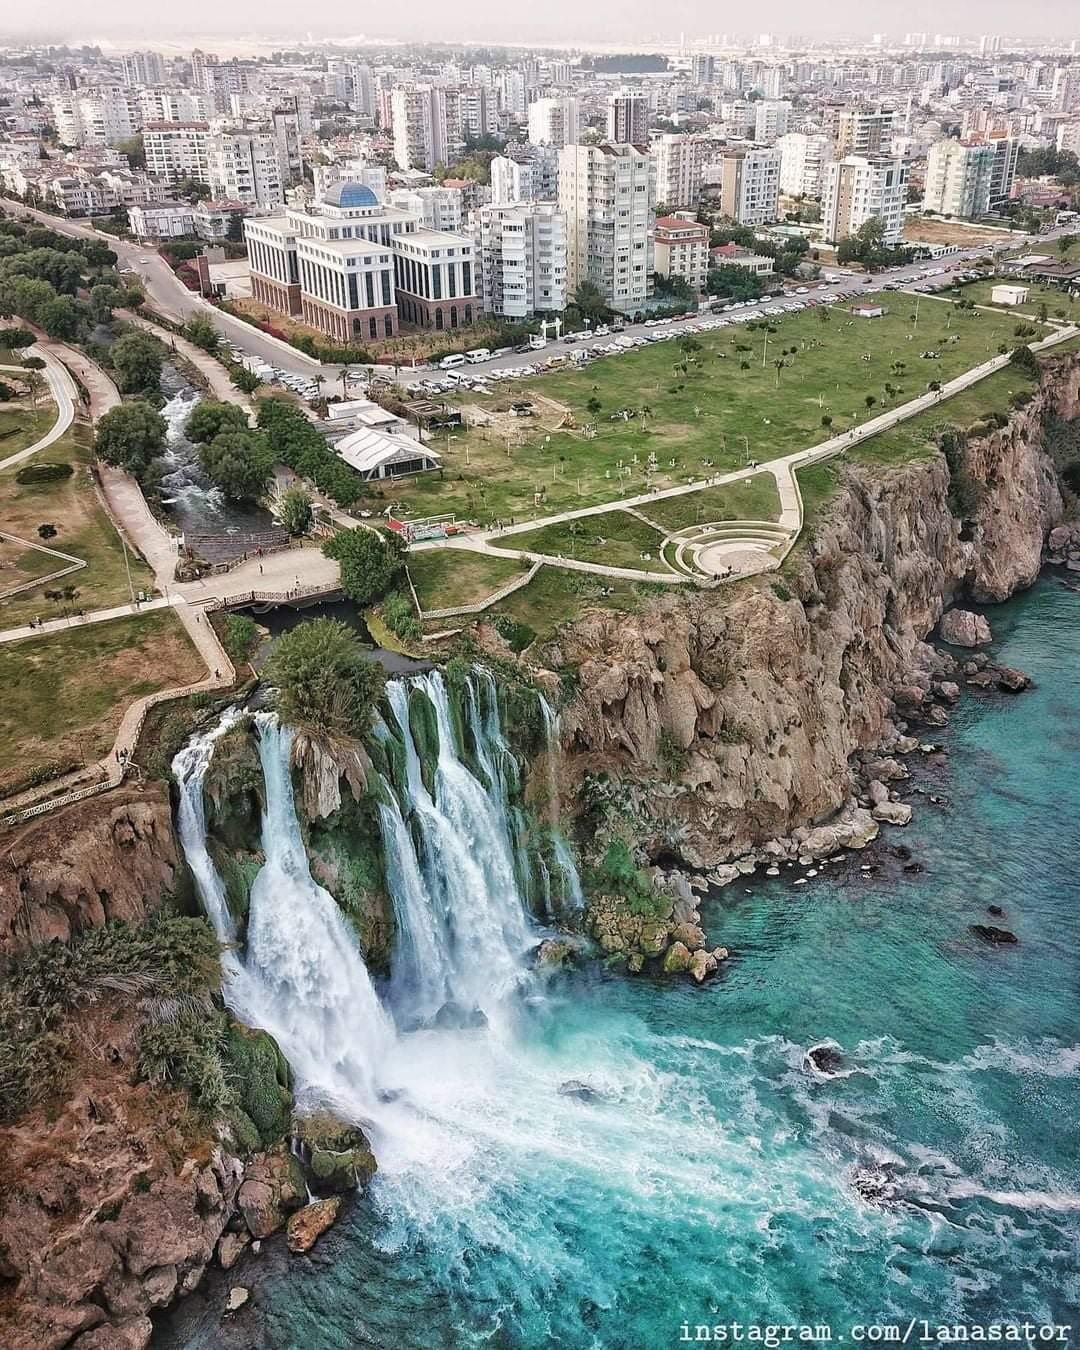 Most Amazing City waterfall in Antalya